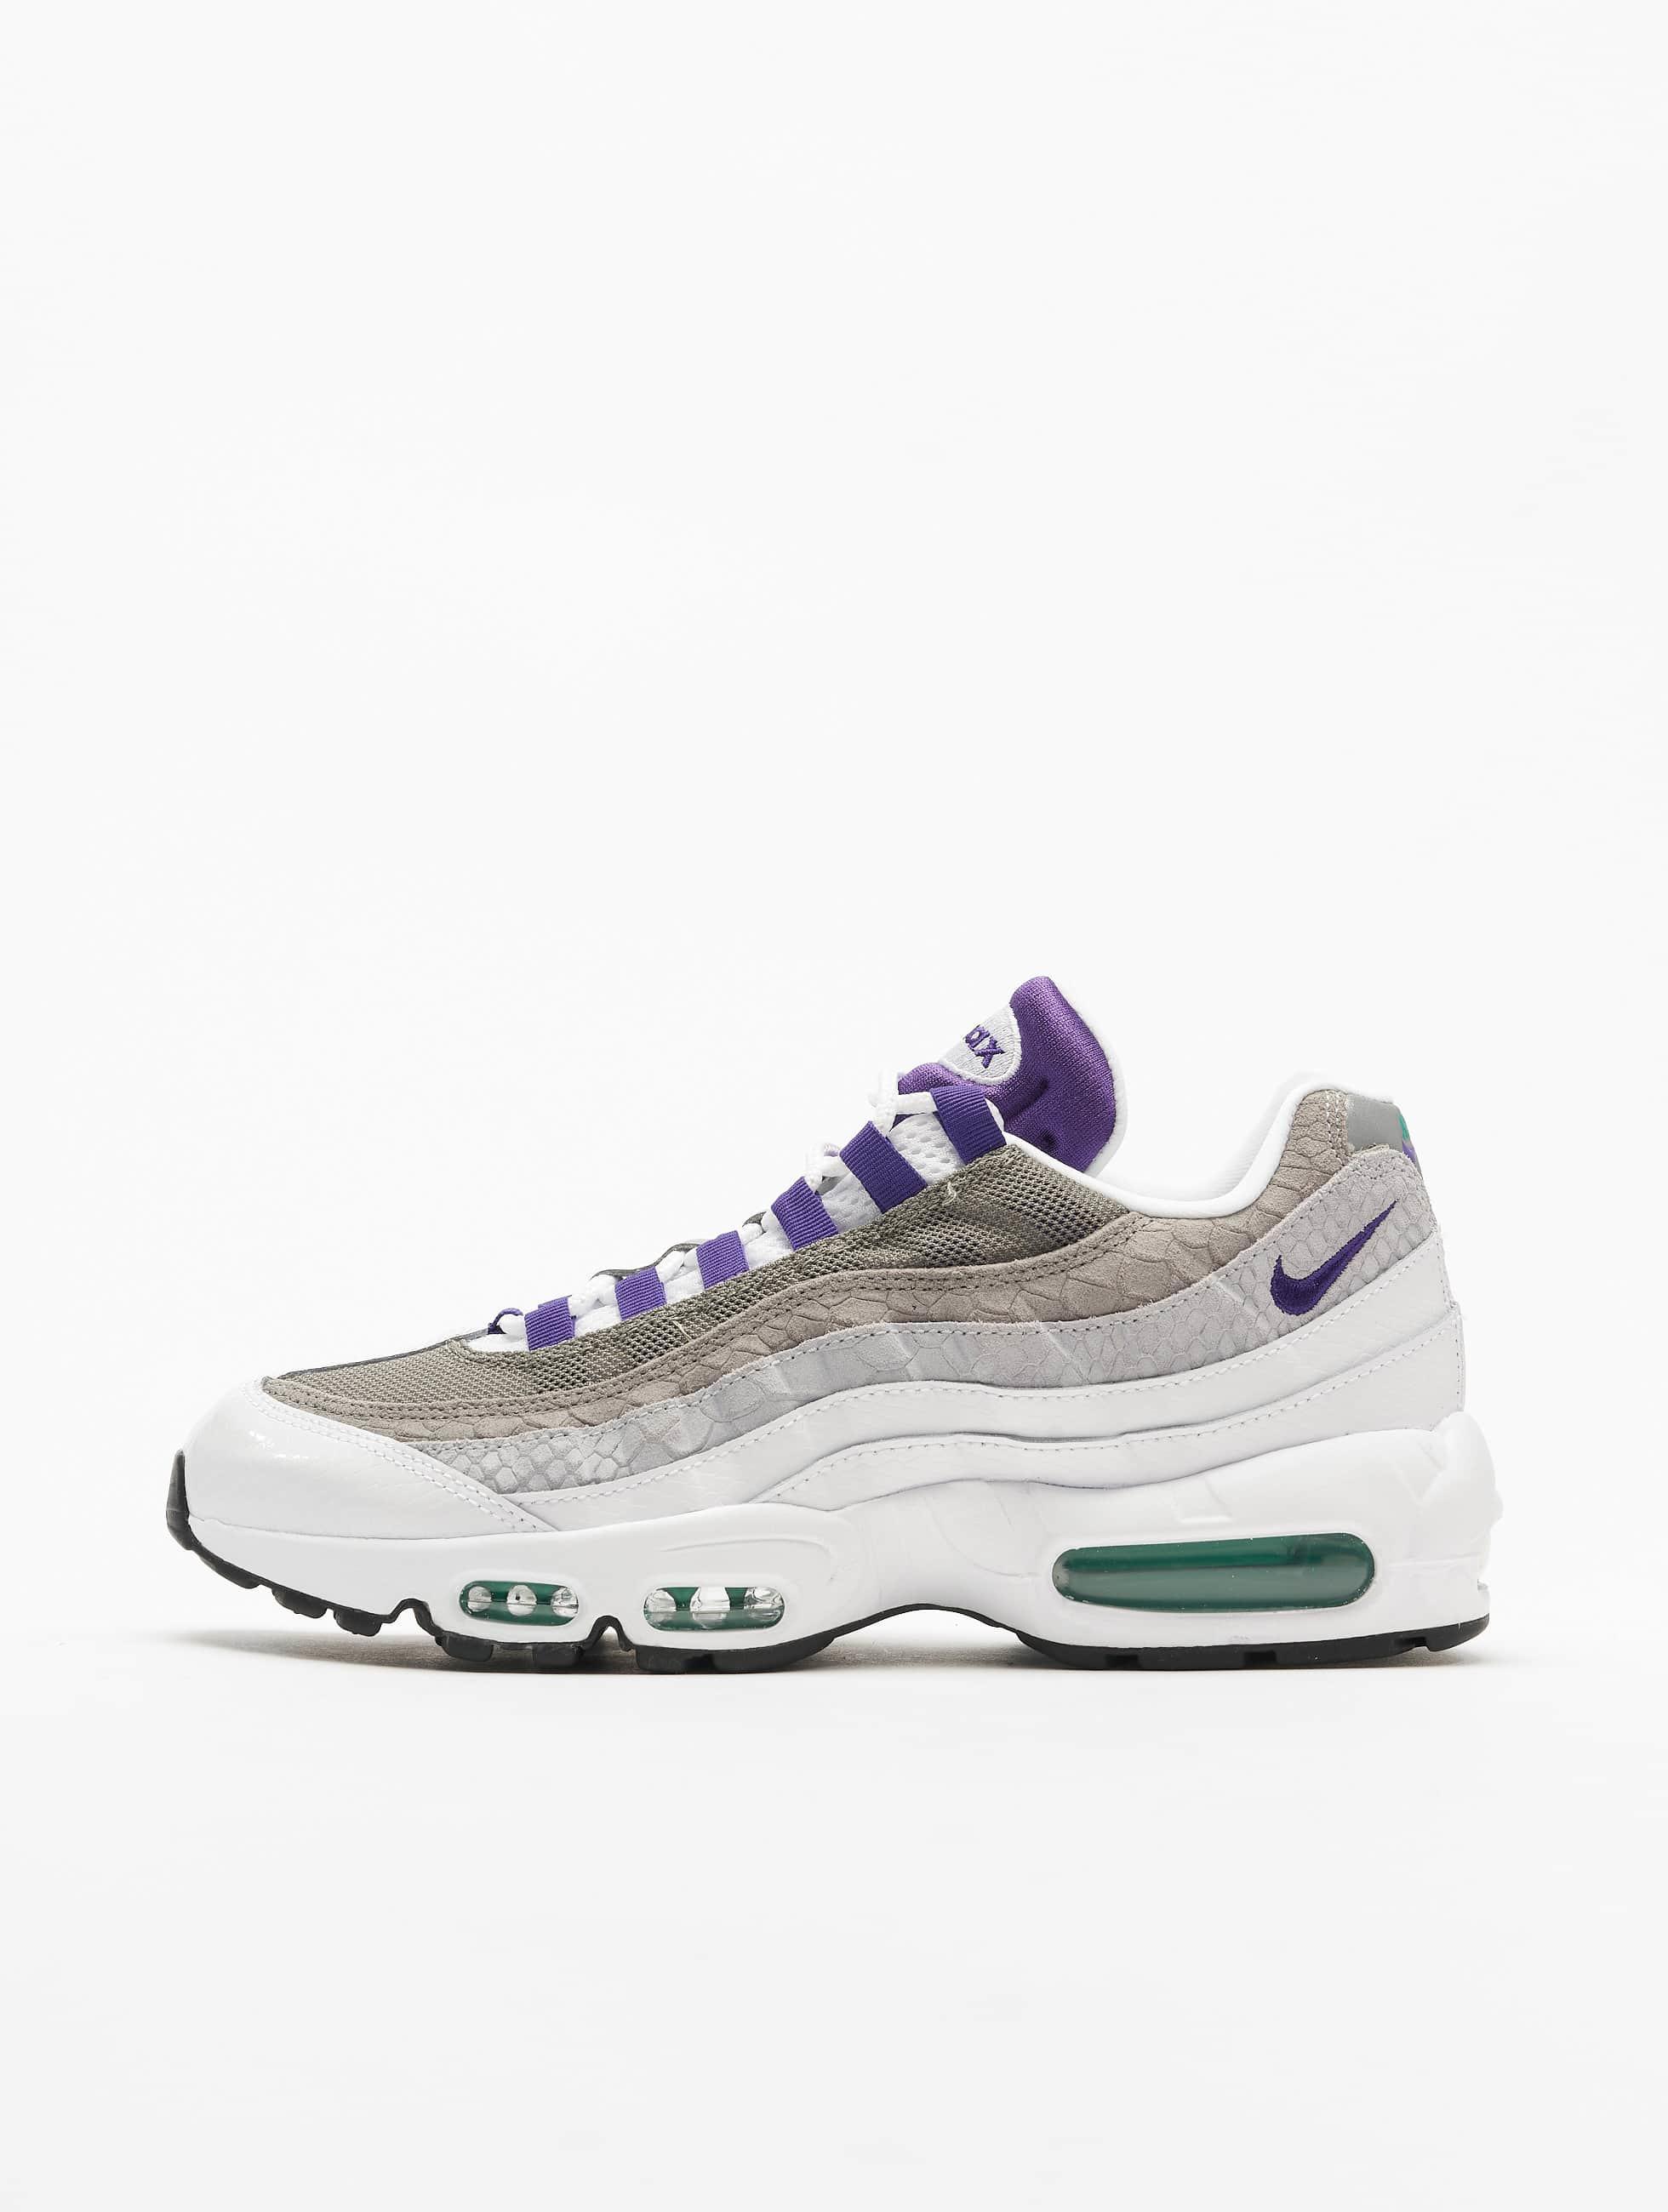 Nike Air Max 95 LV8 Sneakers WhiteCourt PurpleEmerald Green